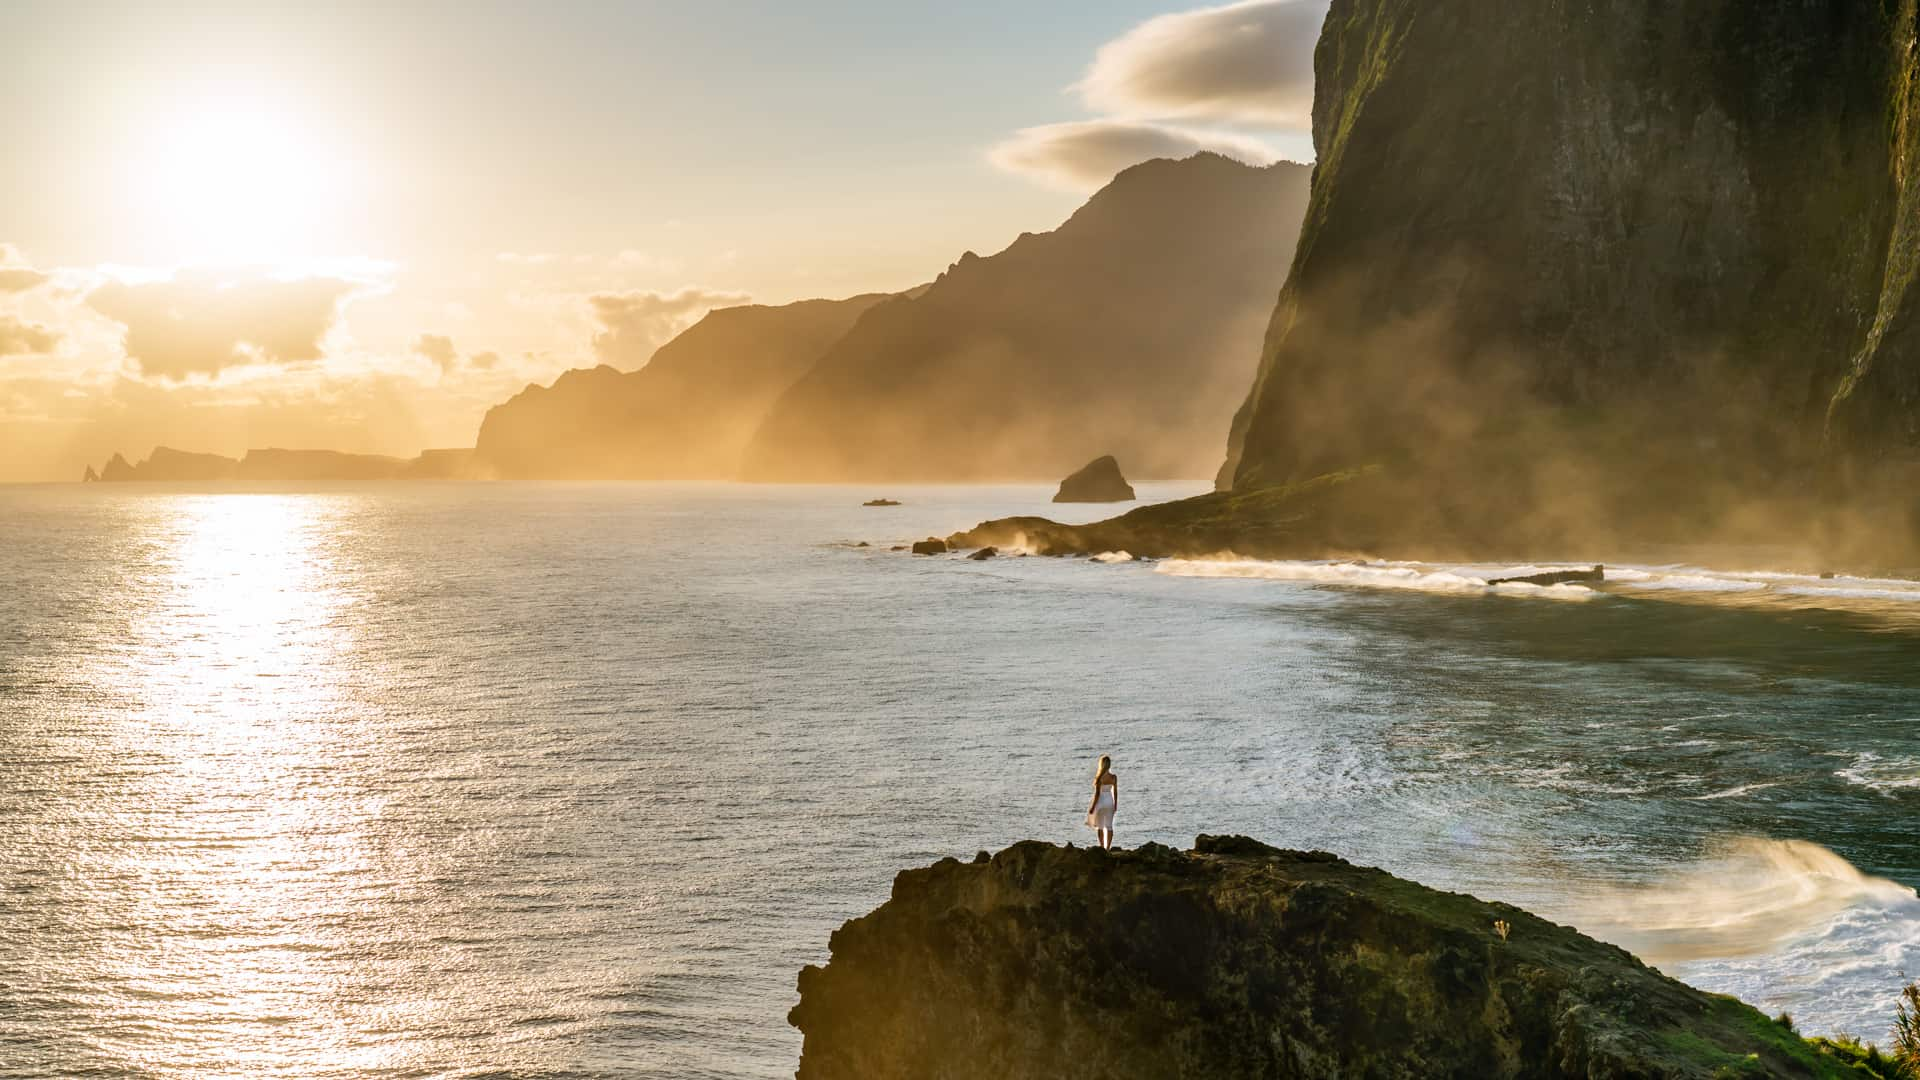 miradouro-do-guindaste-sunrise